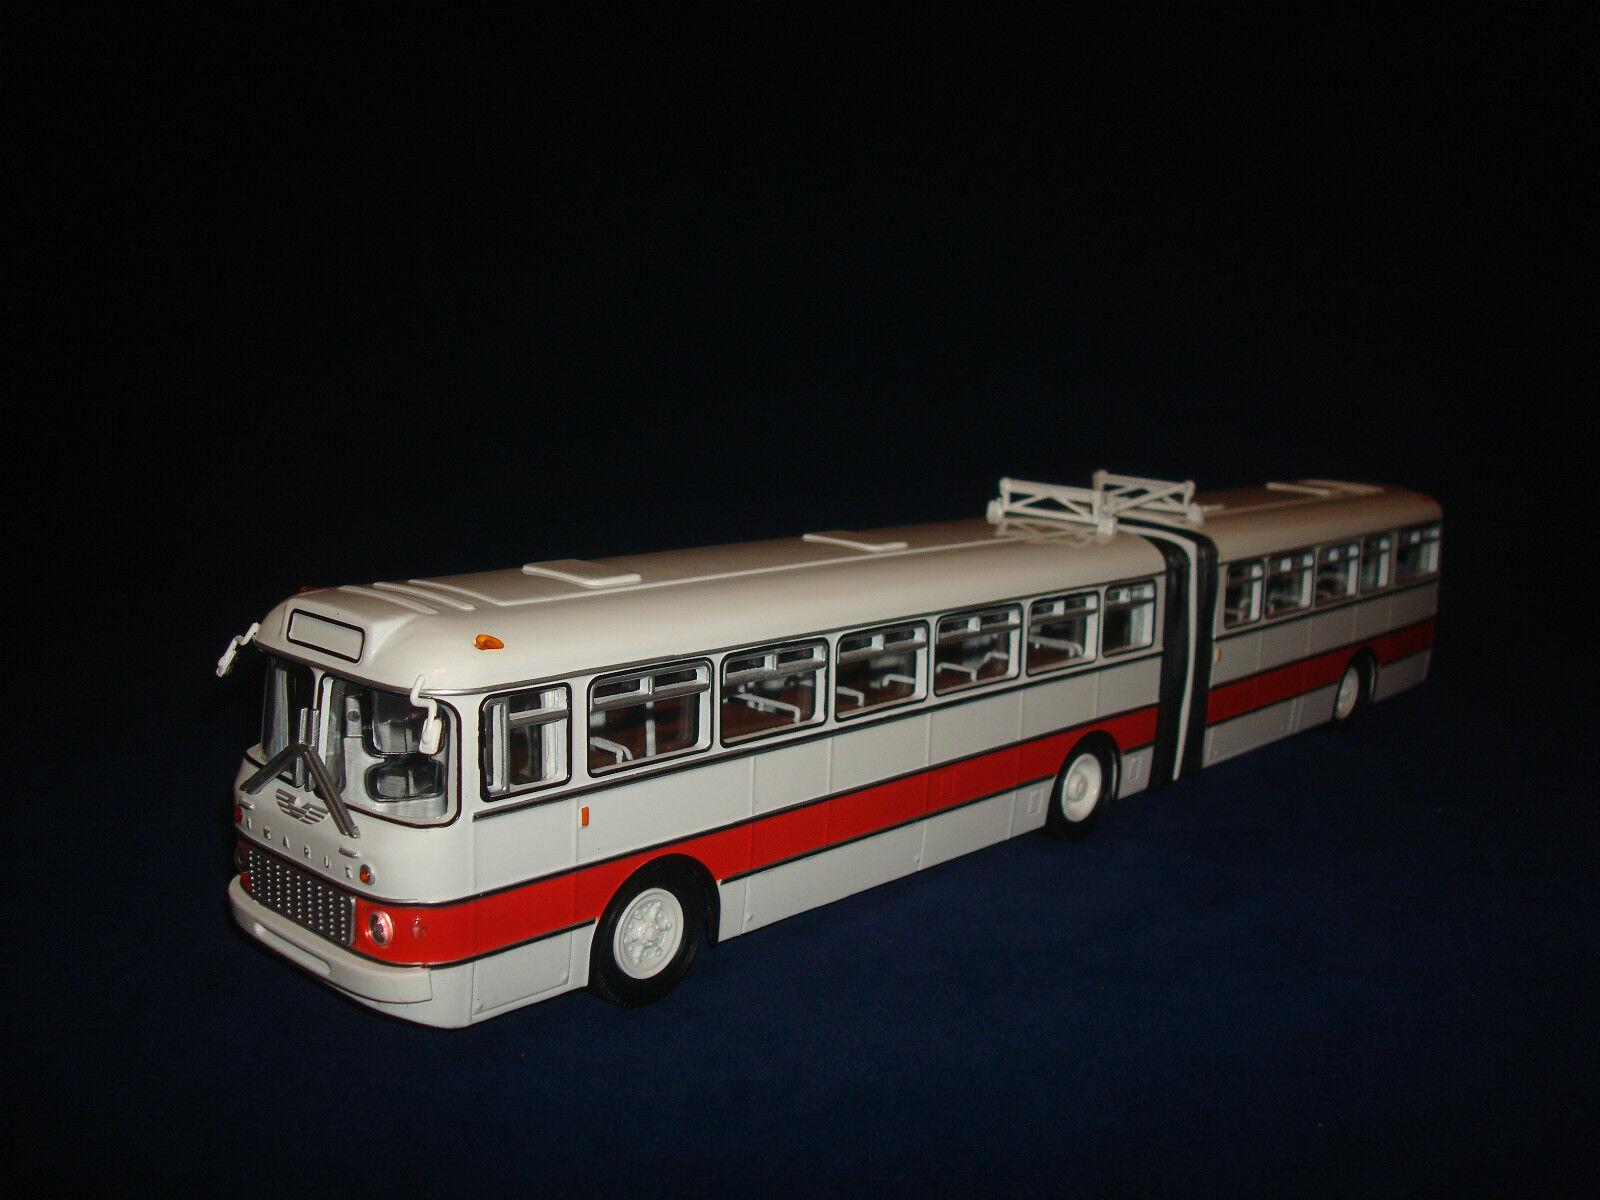 venta caliente Ikarus 180 blancoo-Rojo URSS Soviética Bus 1 1 1 43  garantizado